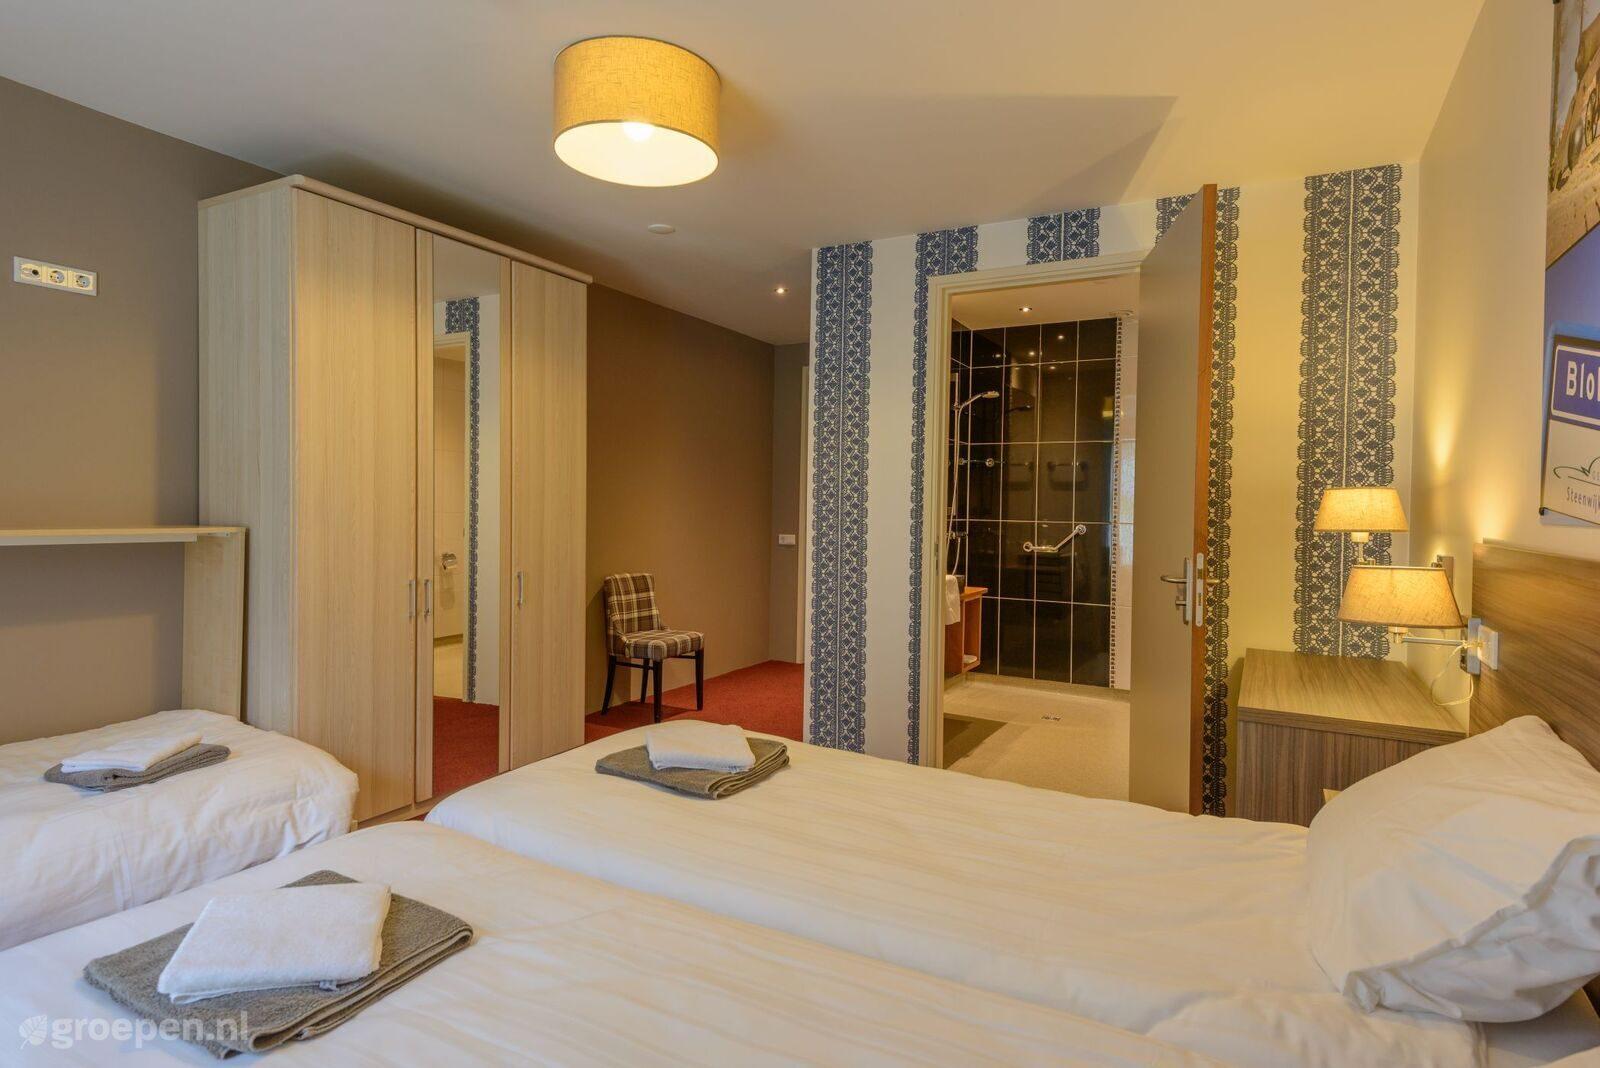 Group accommodation Blokzijl